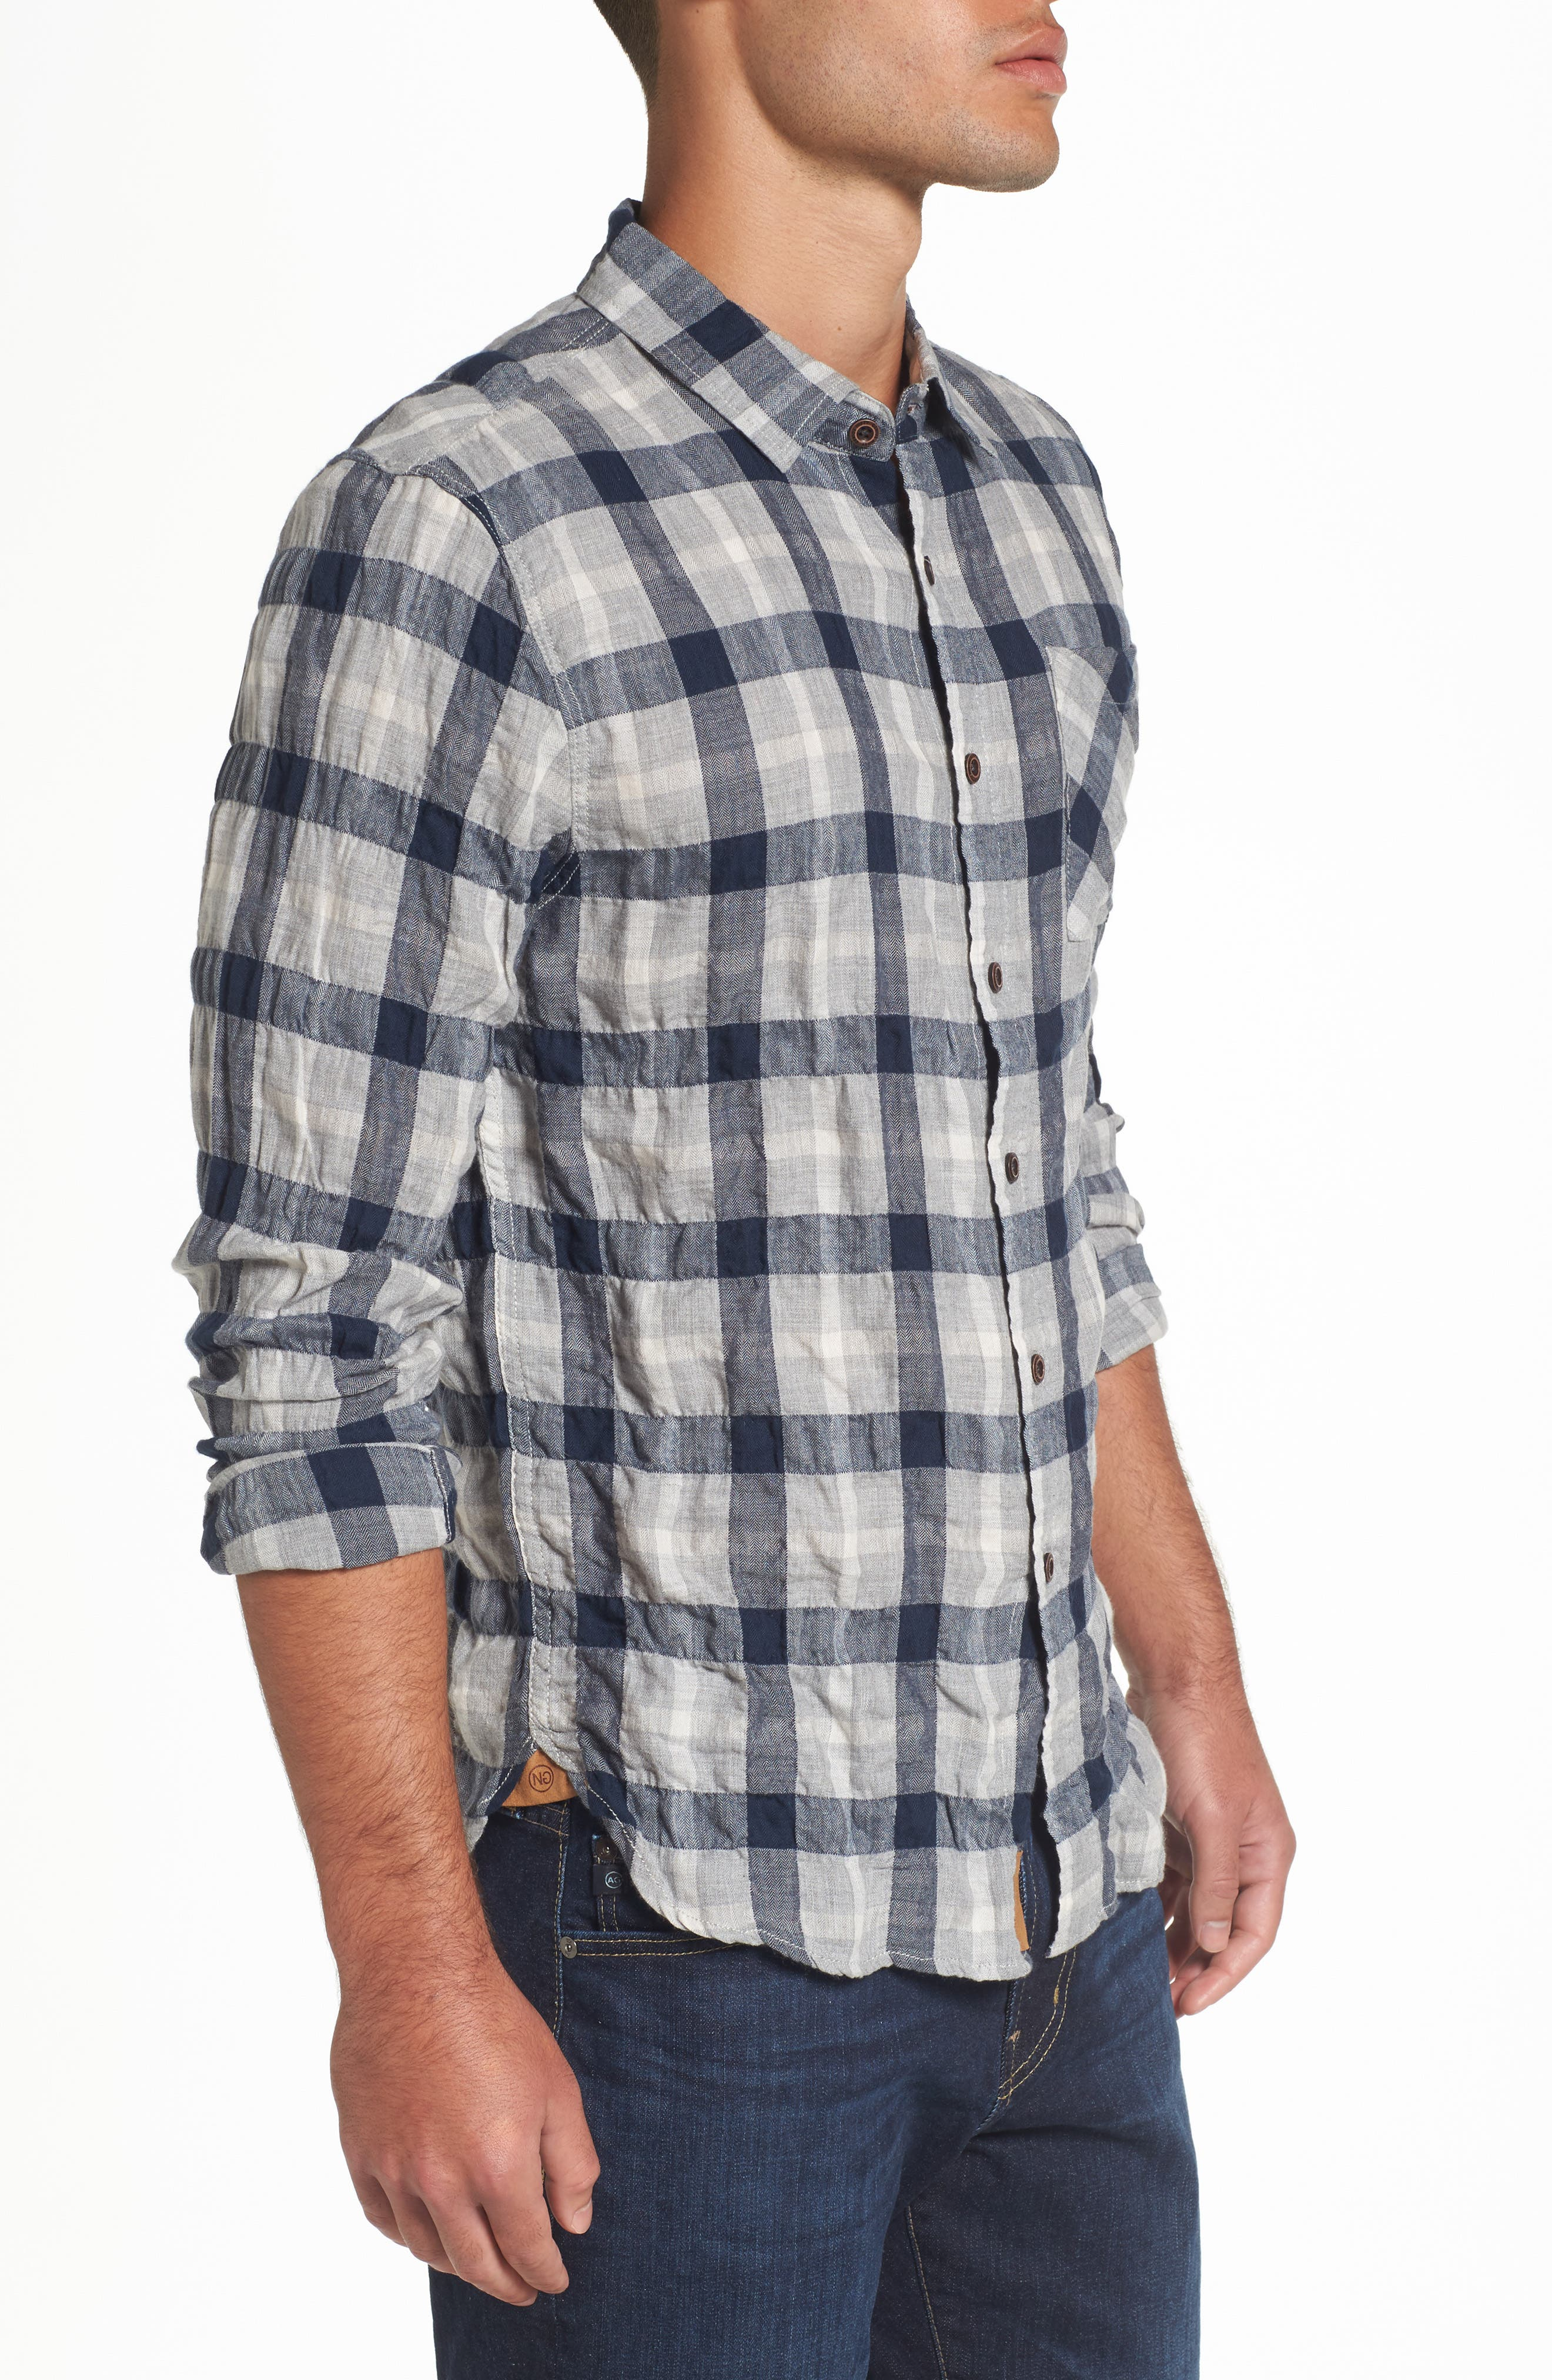 Truman Plaid Sport Shirt,                             Alternate thumbnail 3, color,                             Gray/ Navy/ White